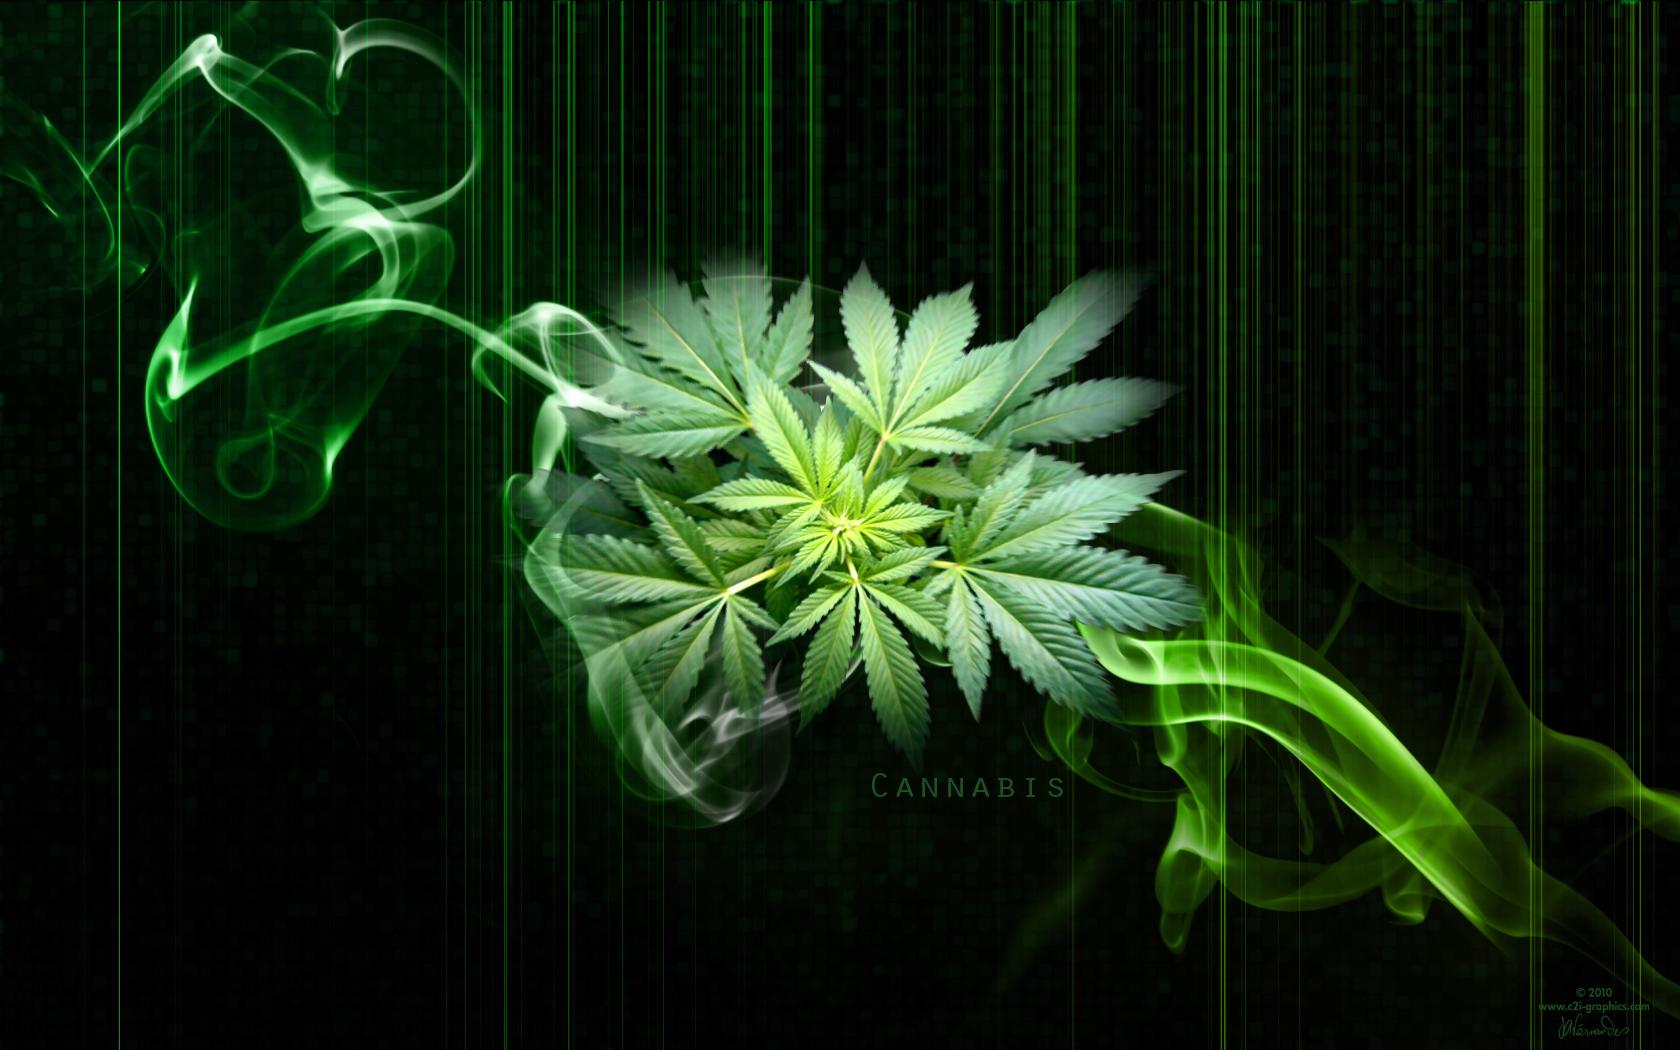 Pot wallpaper wallpapersafari - Free marijuana desktop backgrounds ...